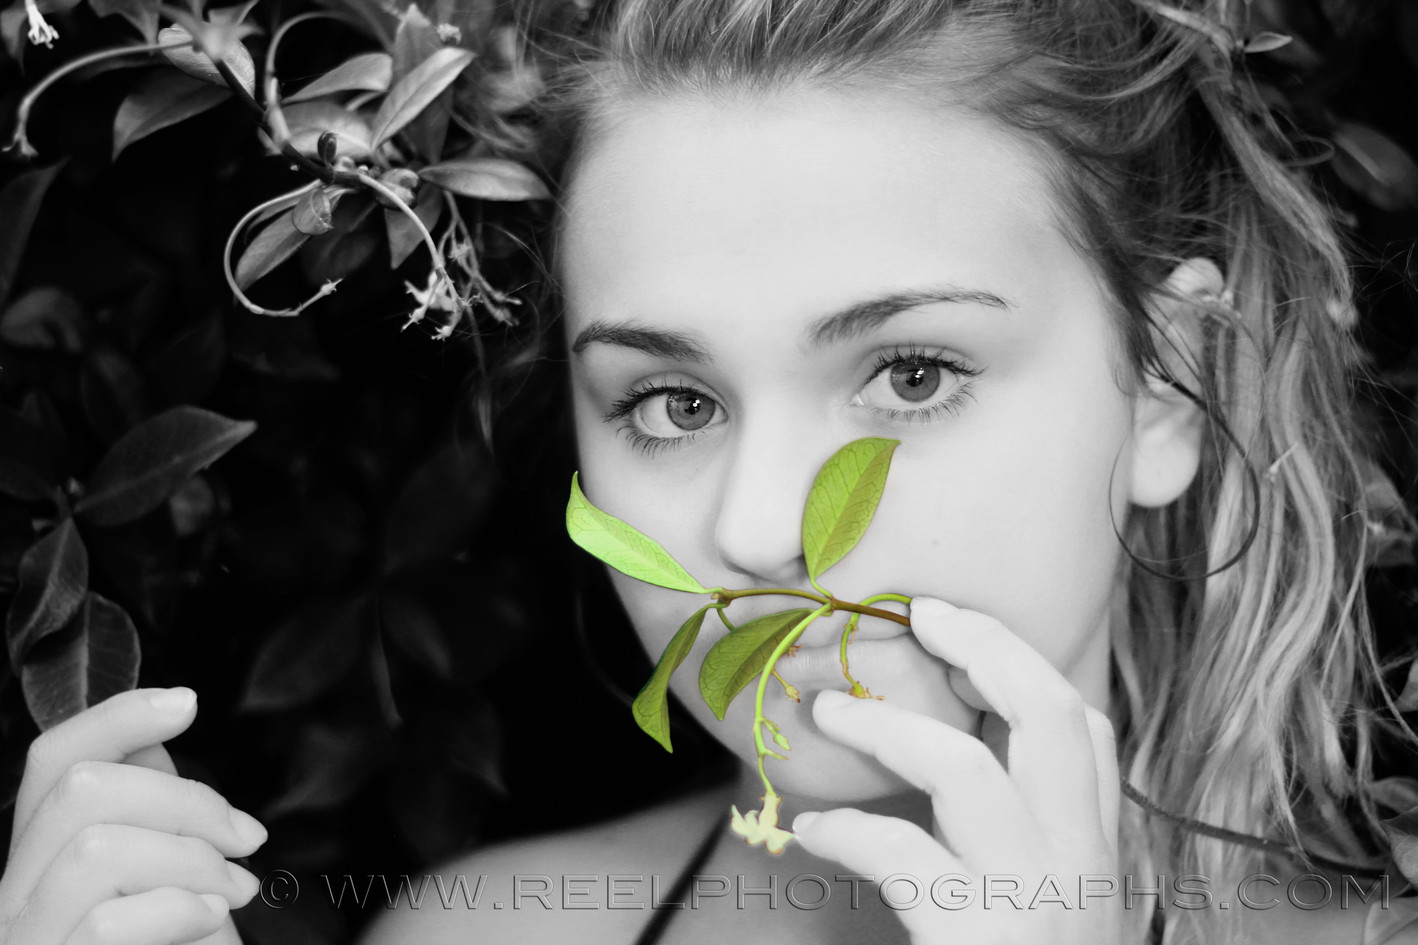 Image by Alicia Pavis - retouching by Alicia Pavlis